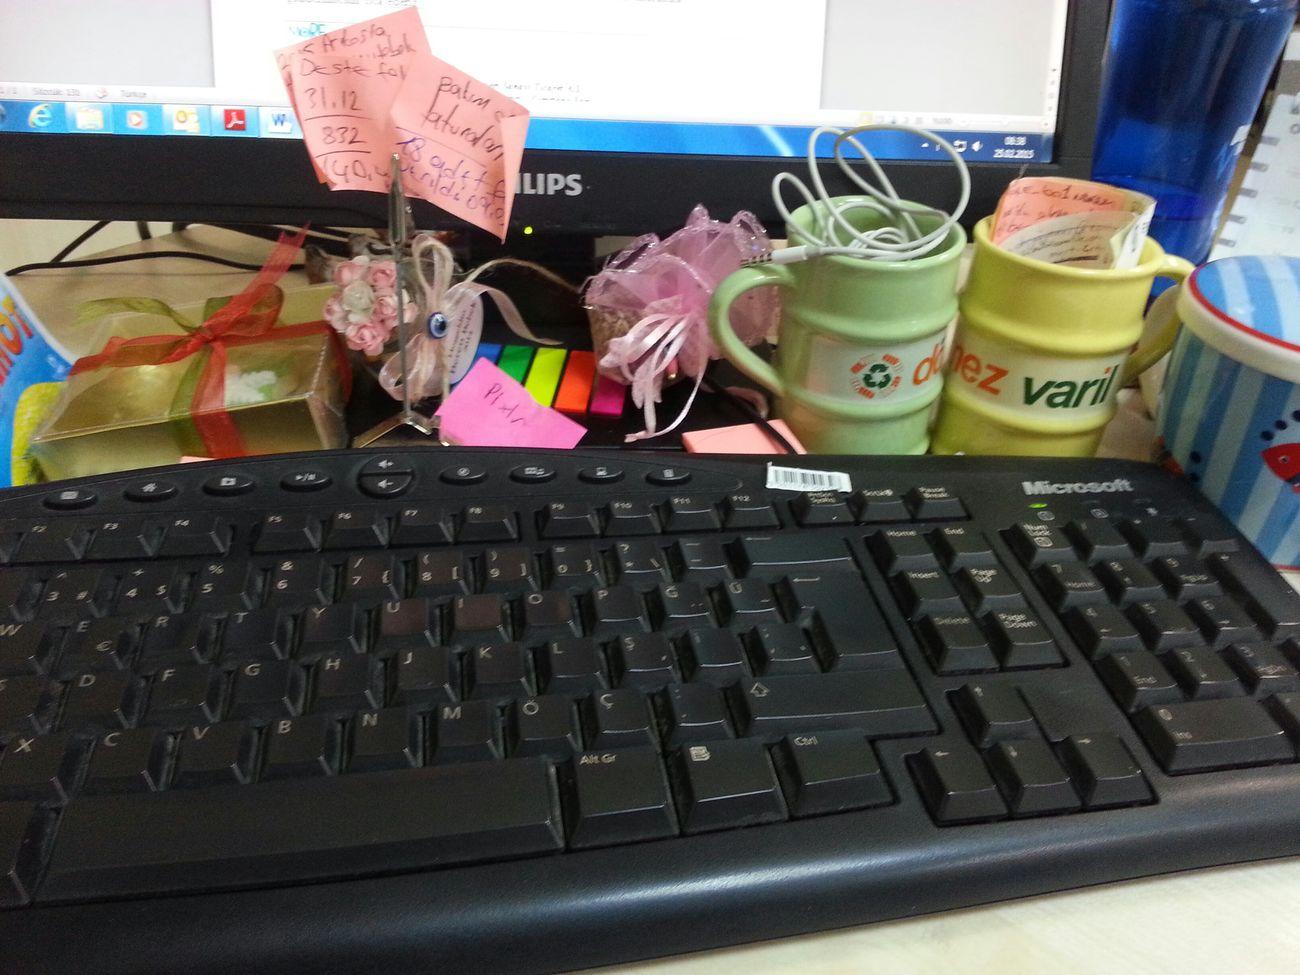 Pek duzenli ol/masamda isimi seviyorum :)